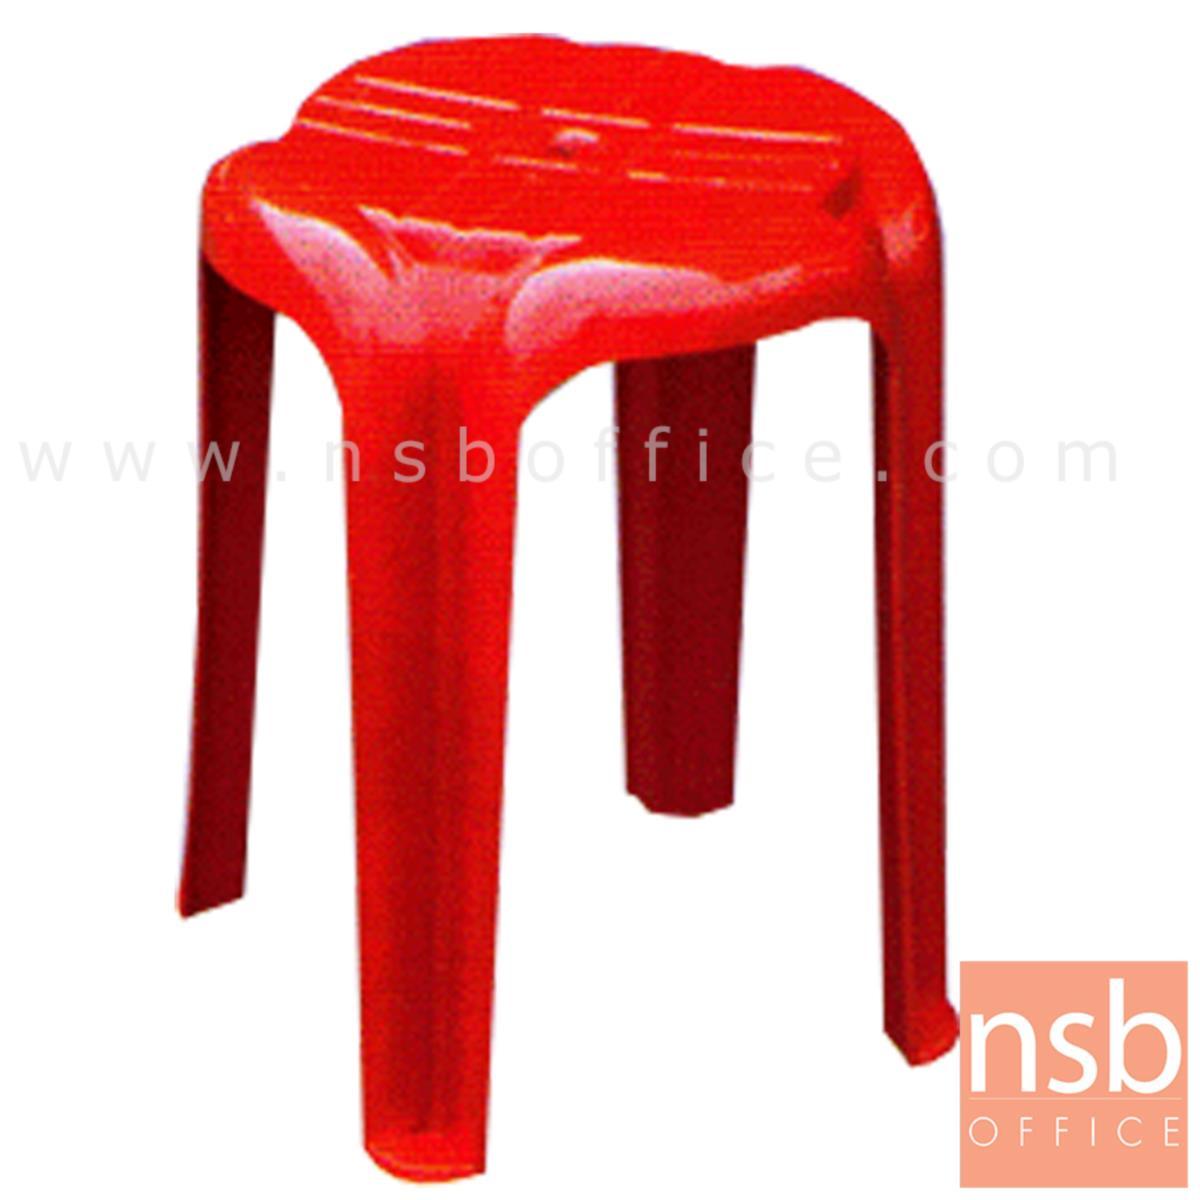 B10A040:เก้าอี้พลาสติกหนาพิเศษ รุ่น Fern (เฟิร์น) ซ้อนทับได้ (พลาสติกเกรด B)